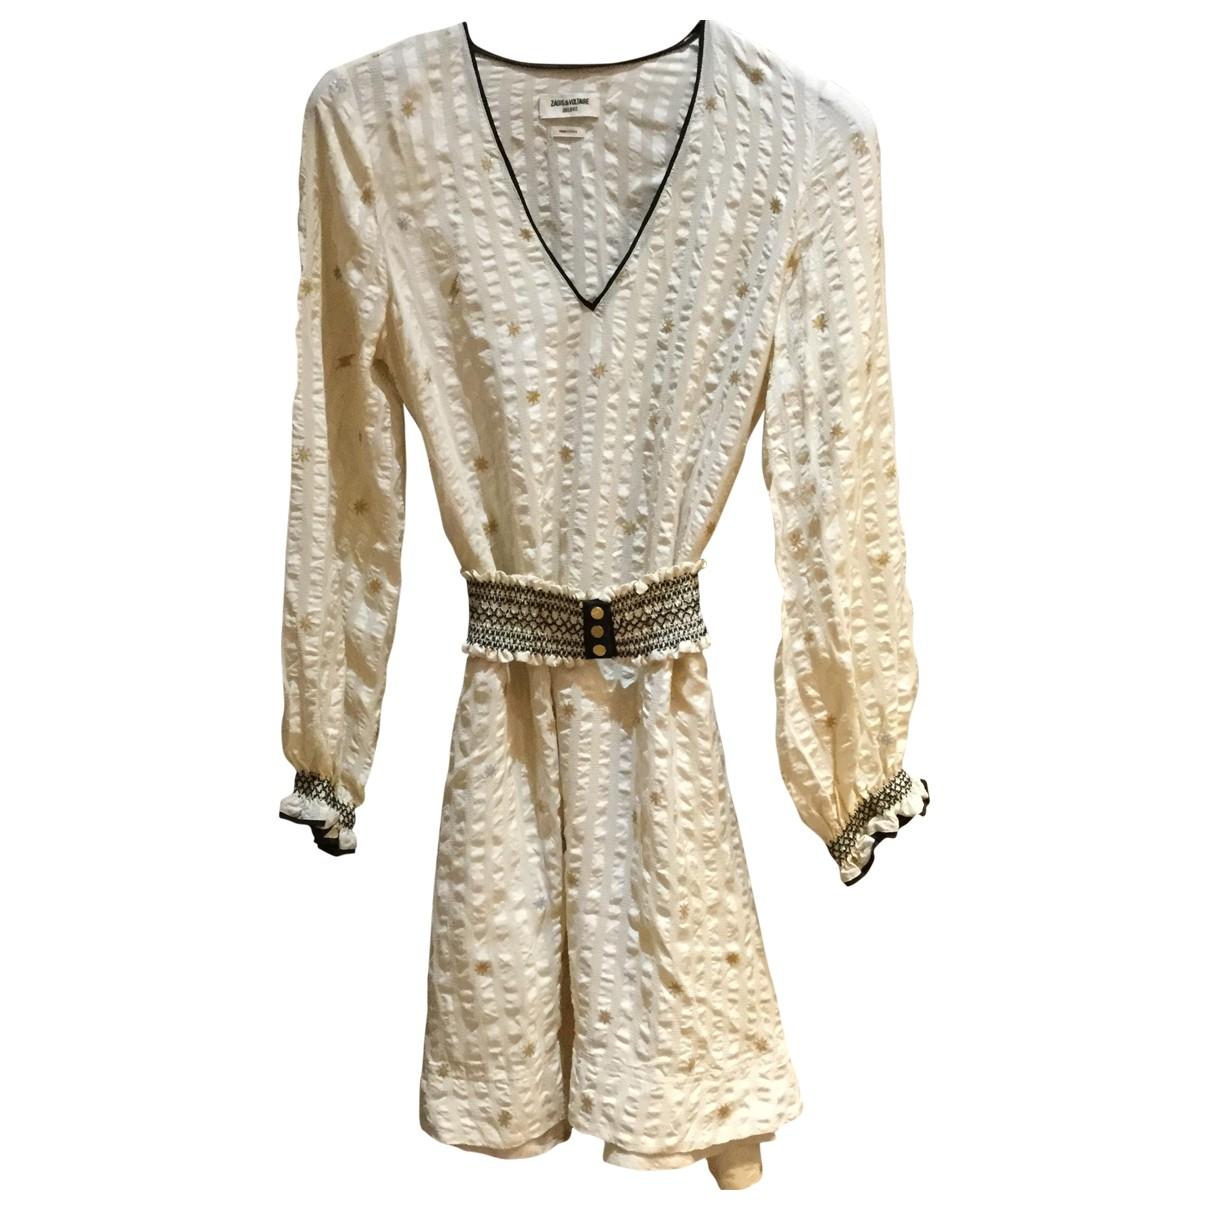 Zadig & Voltaire \N Silk dress for Women XS International